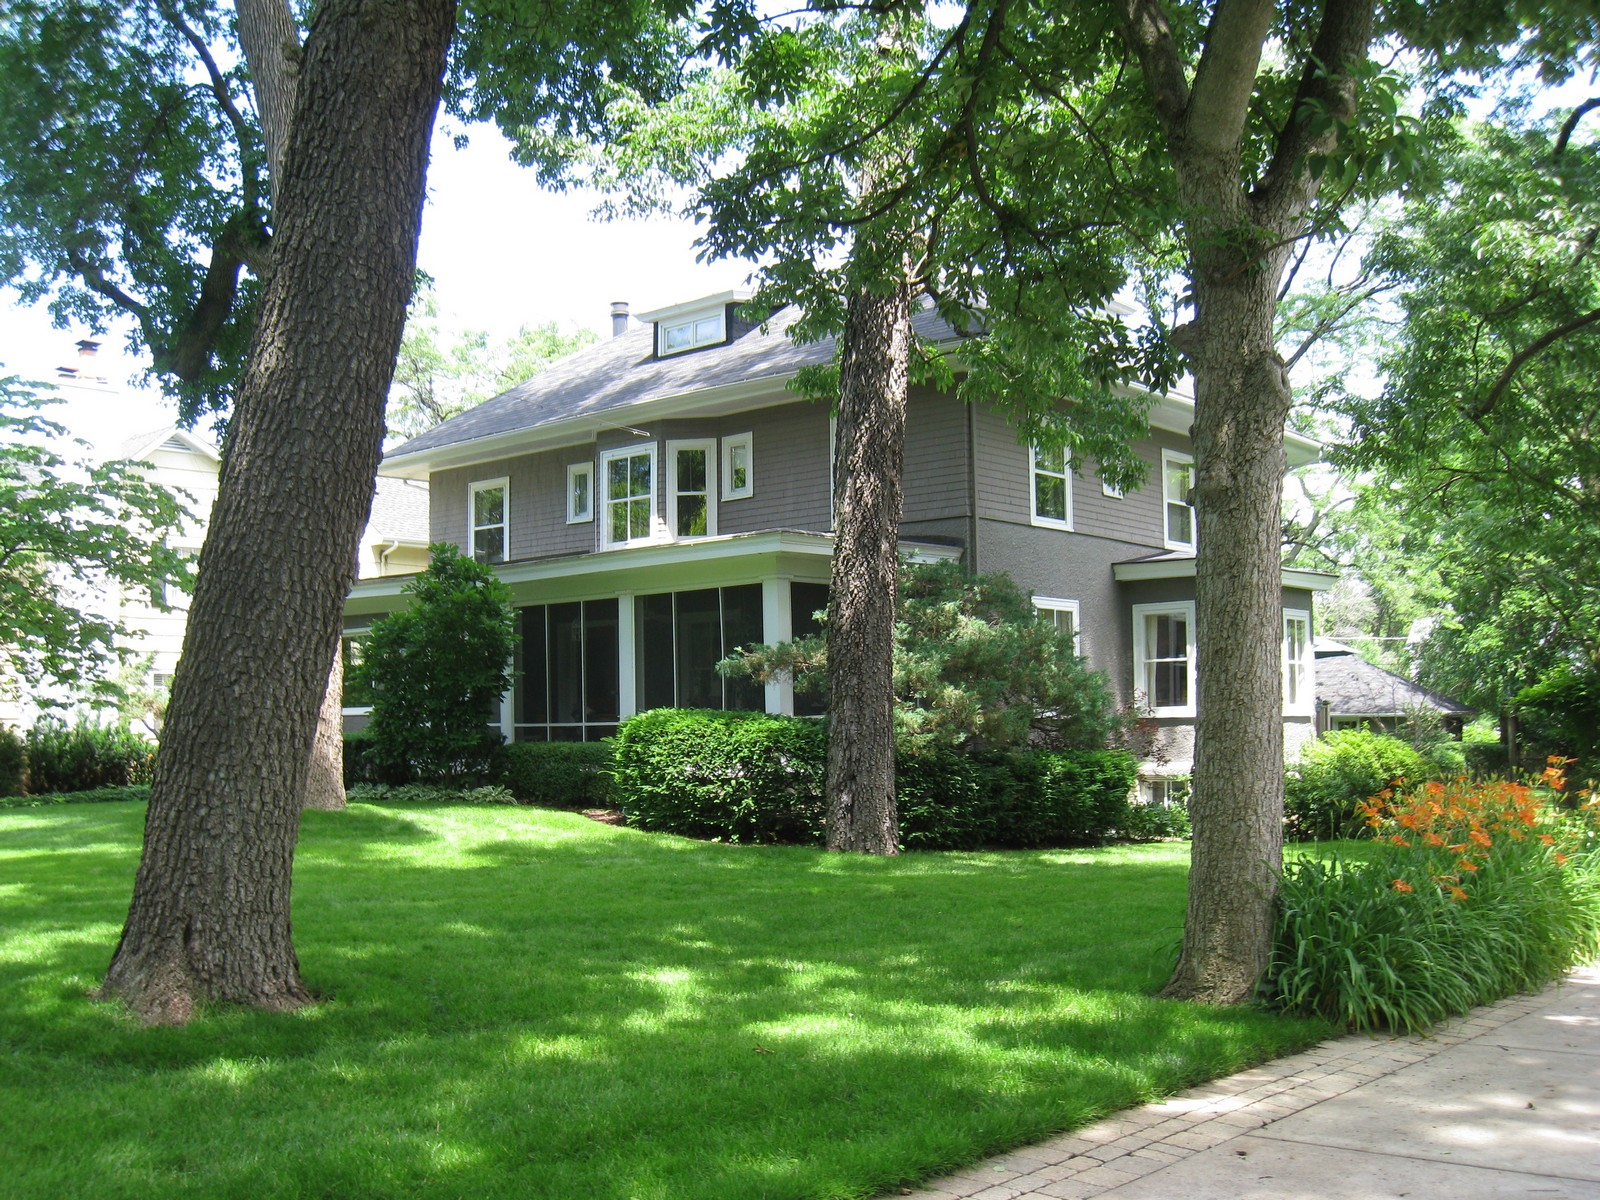 Single Family Home for Sale at 123 N Washington Hinsdale, Illinois, 60521 United States